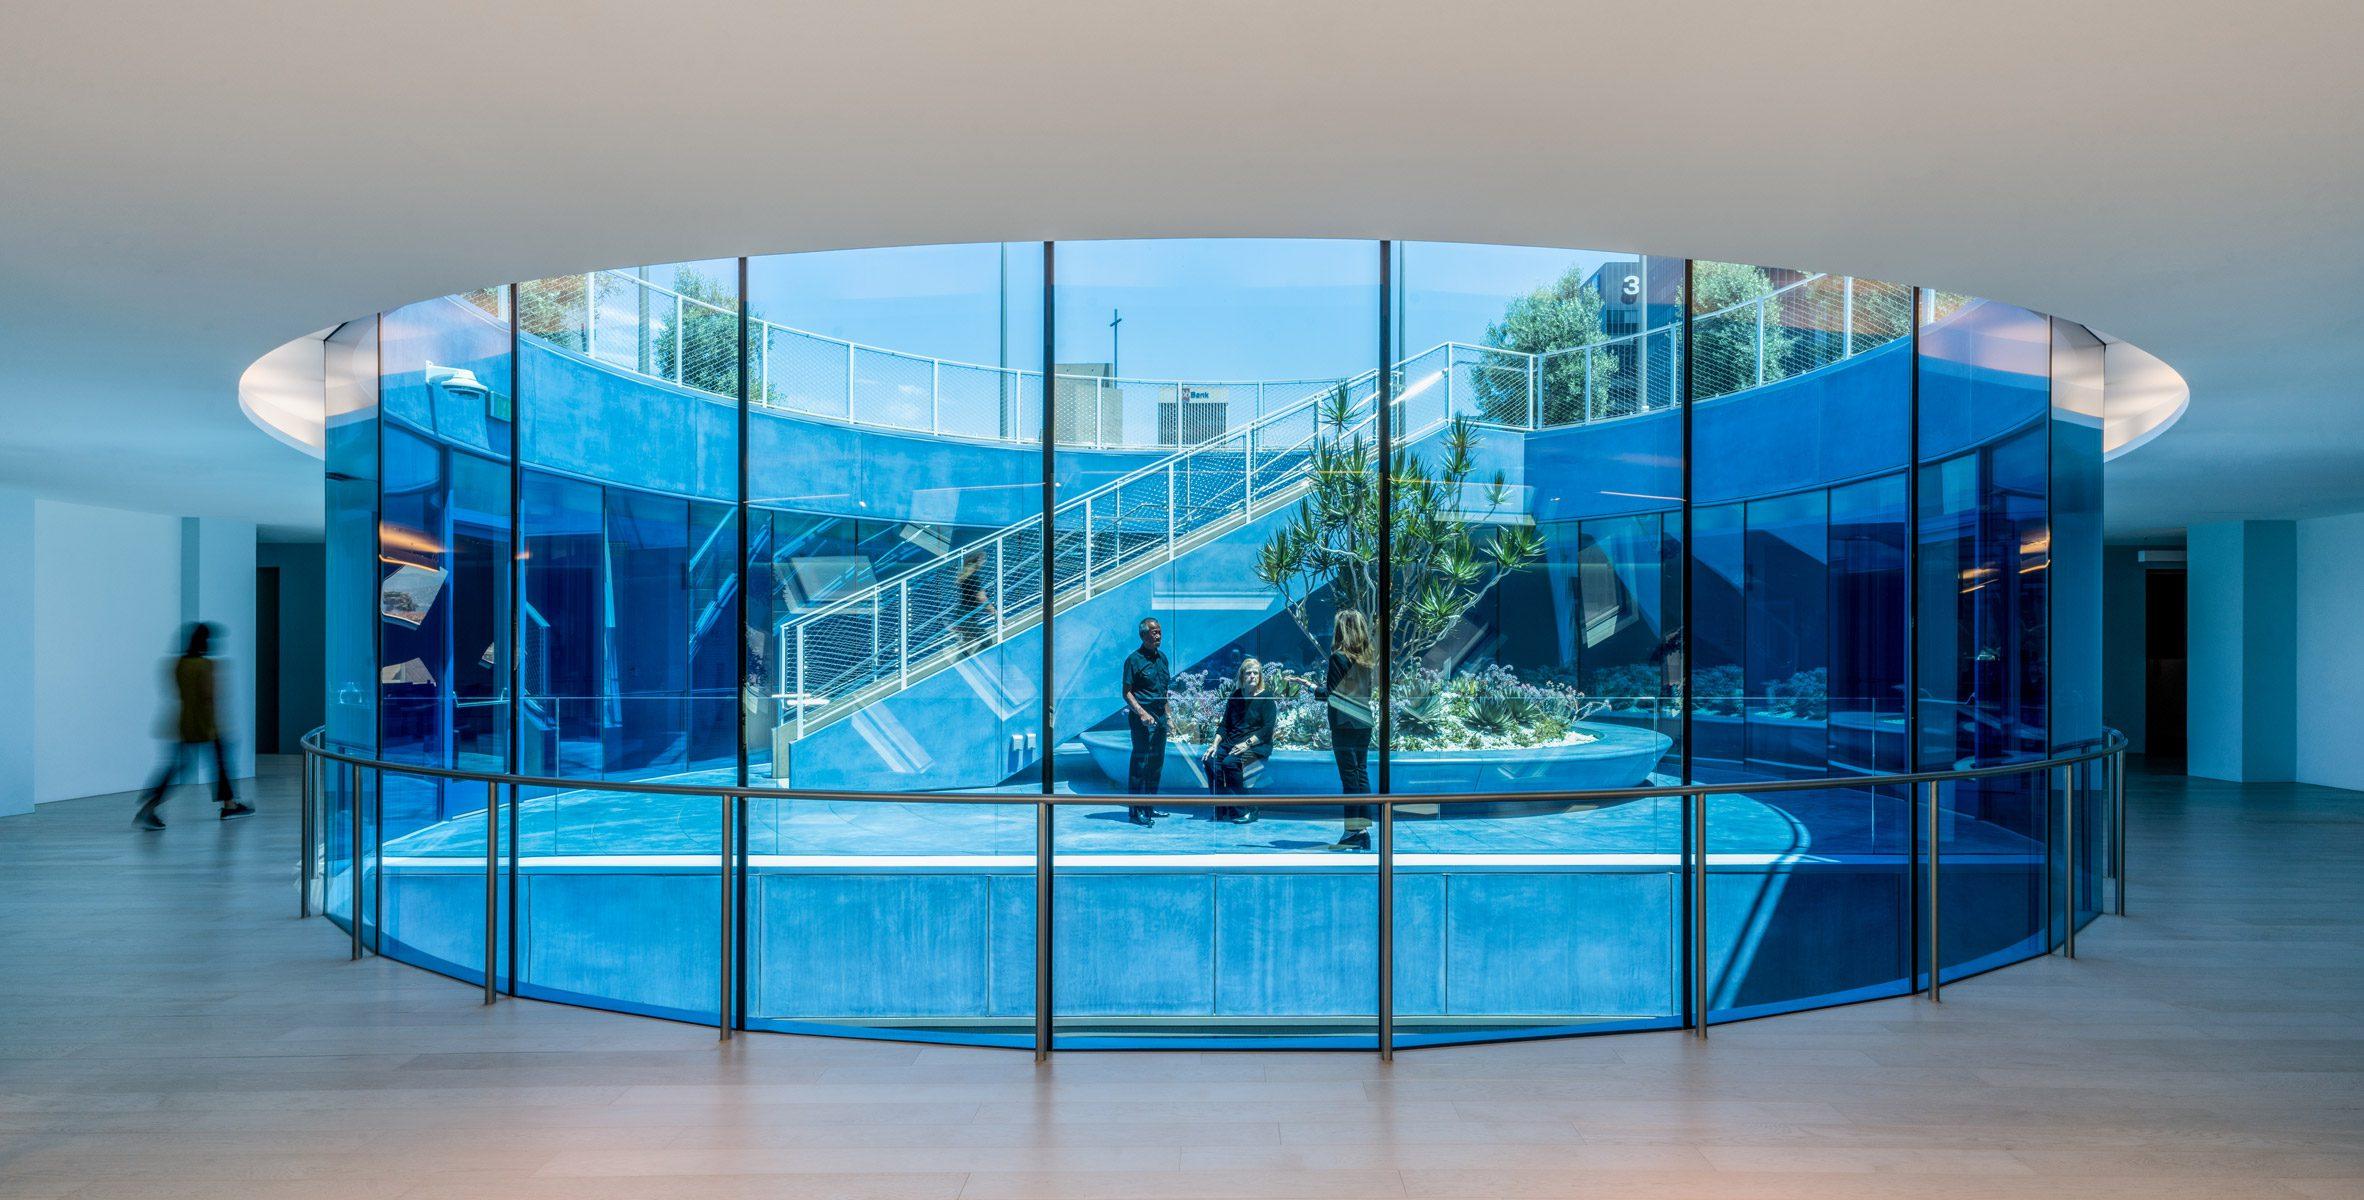 Blue glass surrounding the sunken roof garden